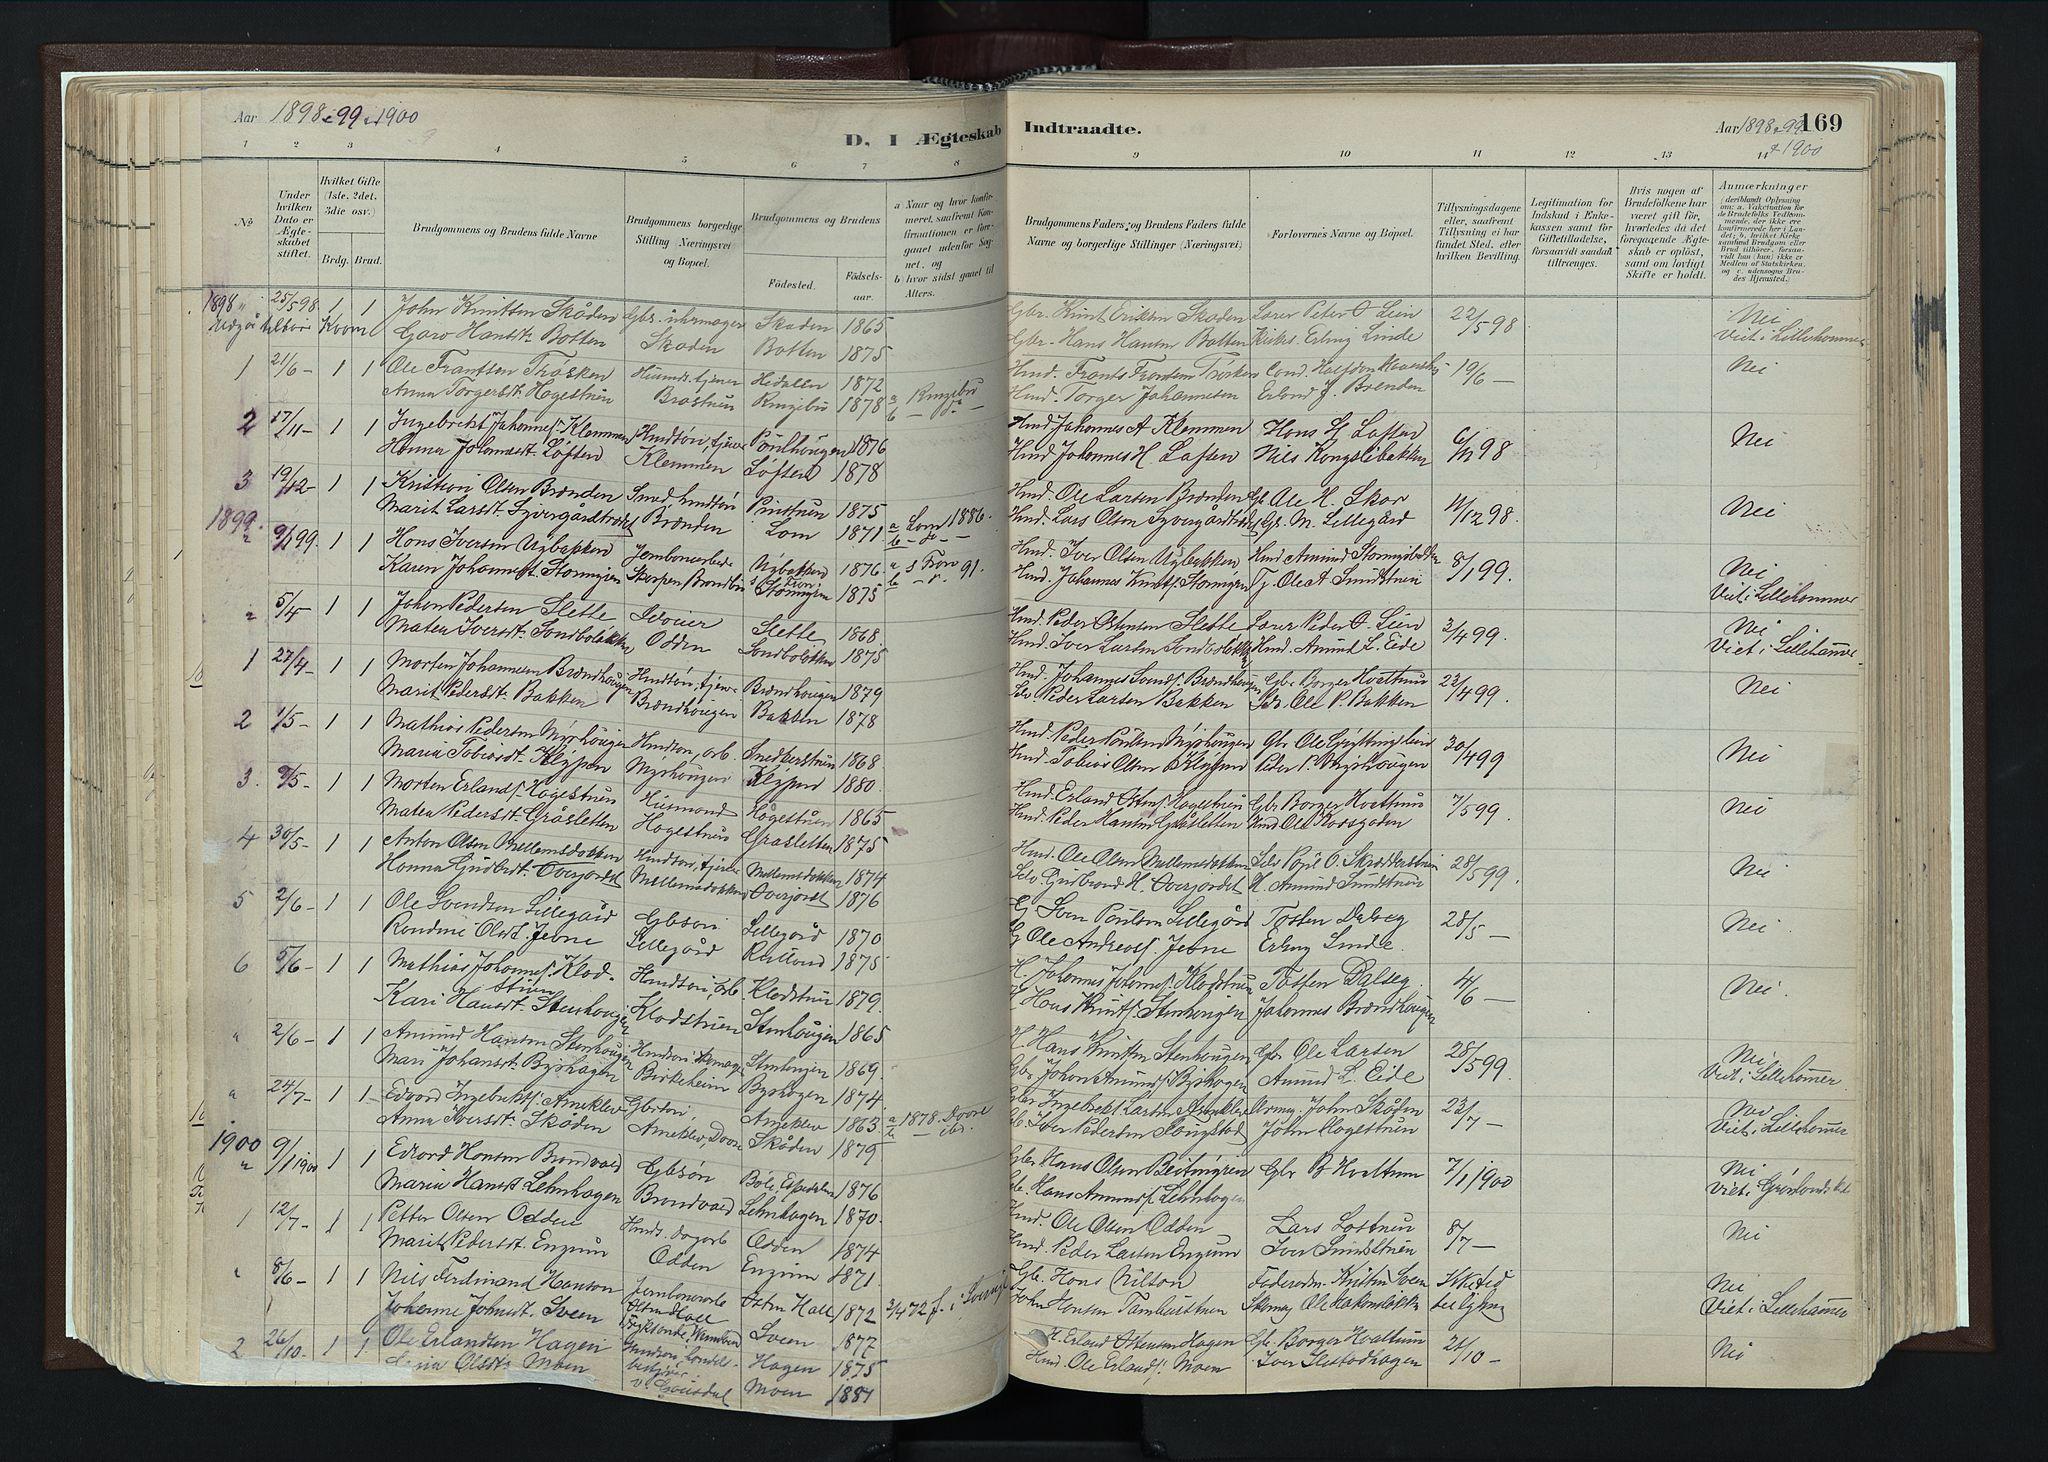 SAH, Nord-Fron prestekontor, Ministerialbok nr. 4, 1884-1914, s. 169